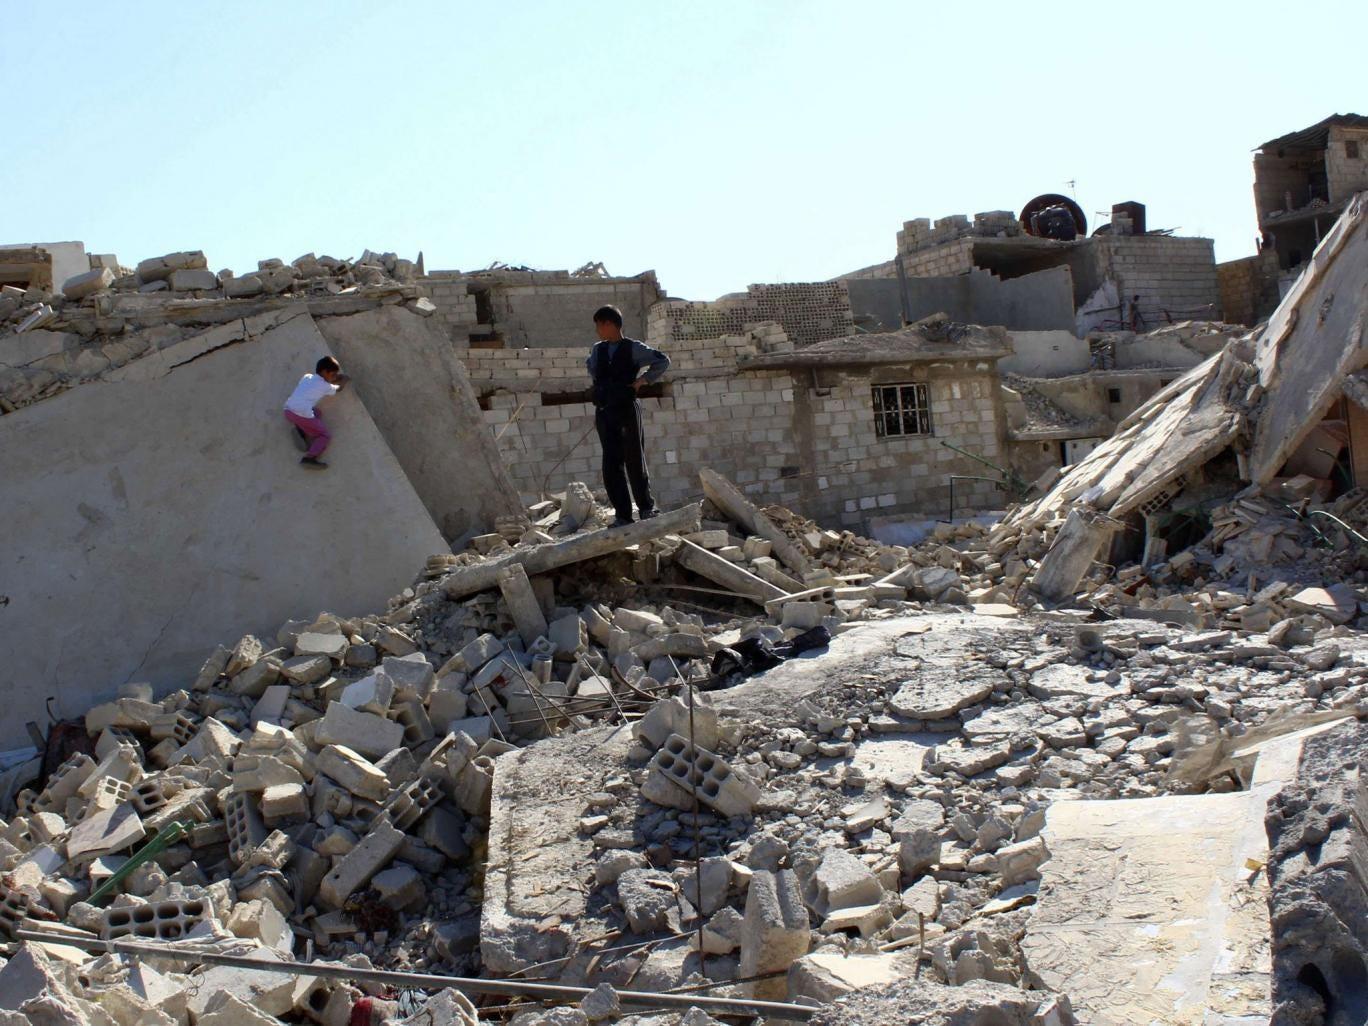 Boys play on debris from damaged buildings in the Duma neighbourhood in Damascus